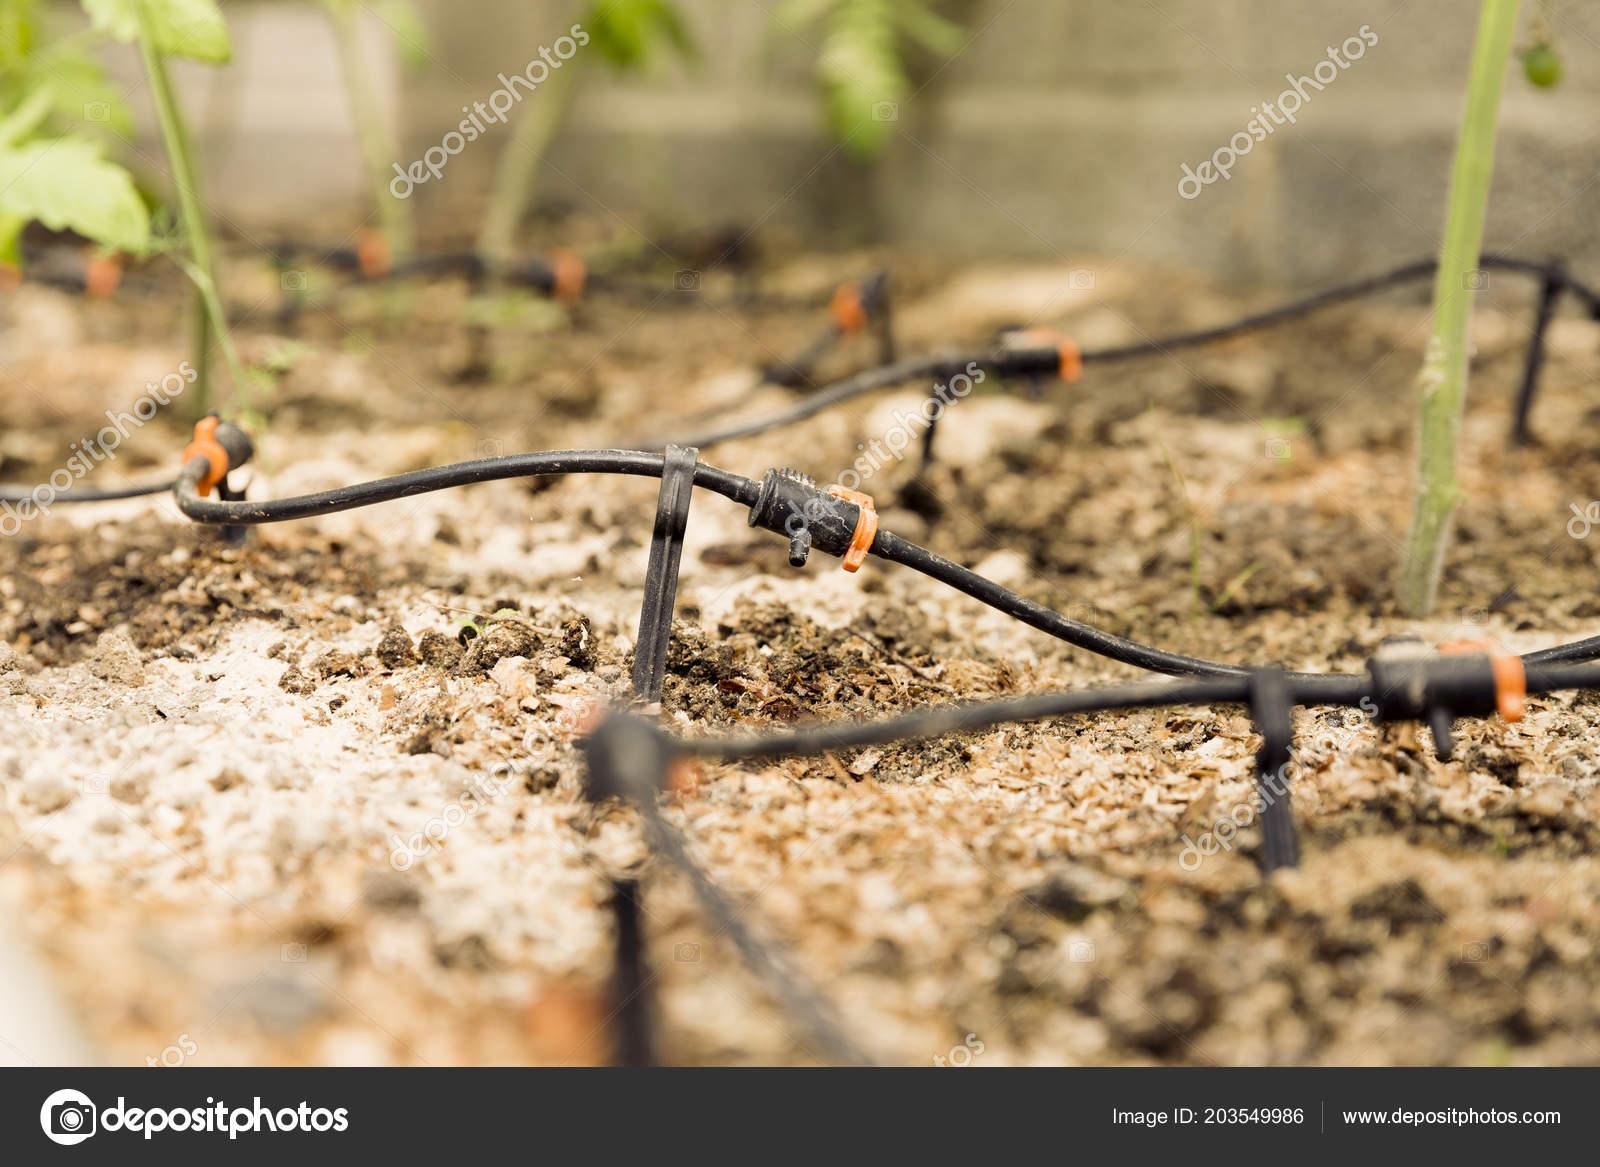 Sprinkler Systems Drip Irrigation Watering Greenhouse Garden ...